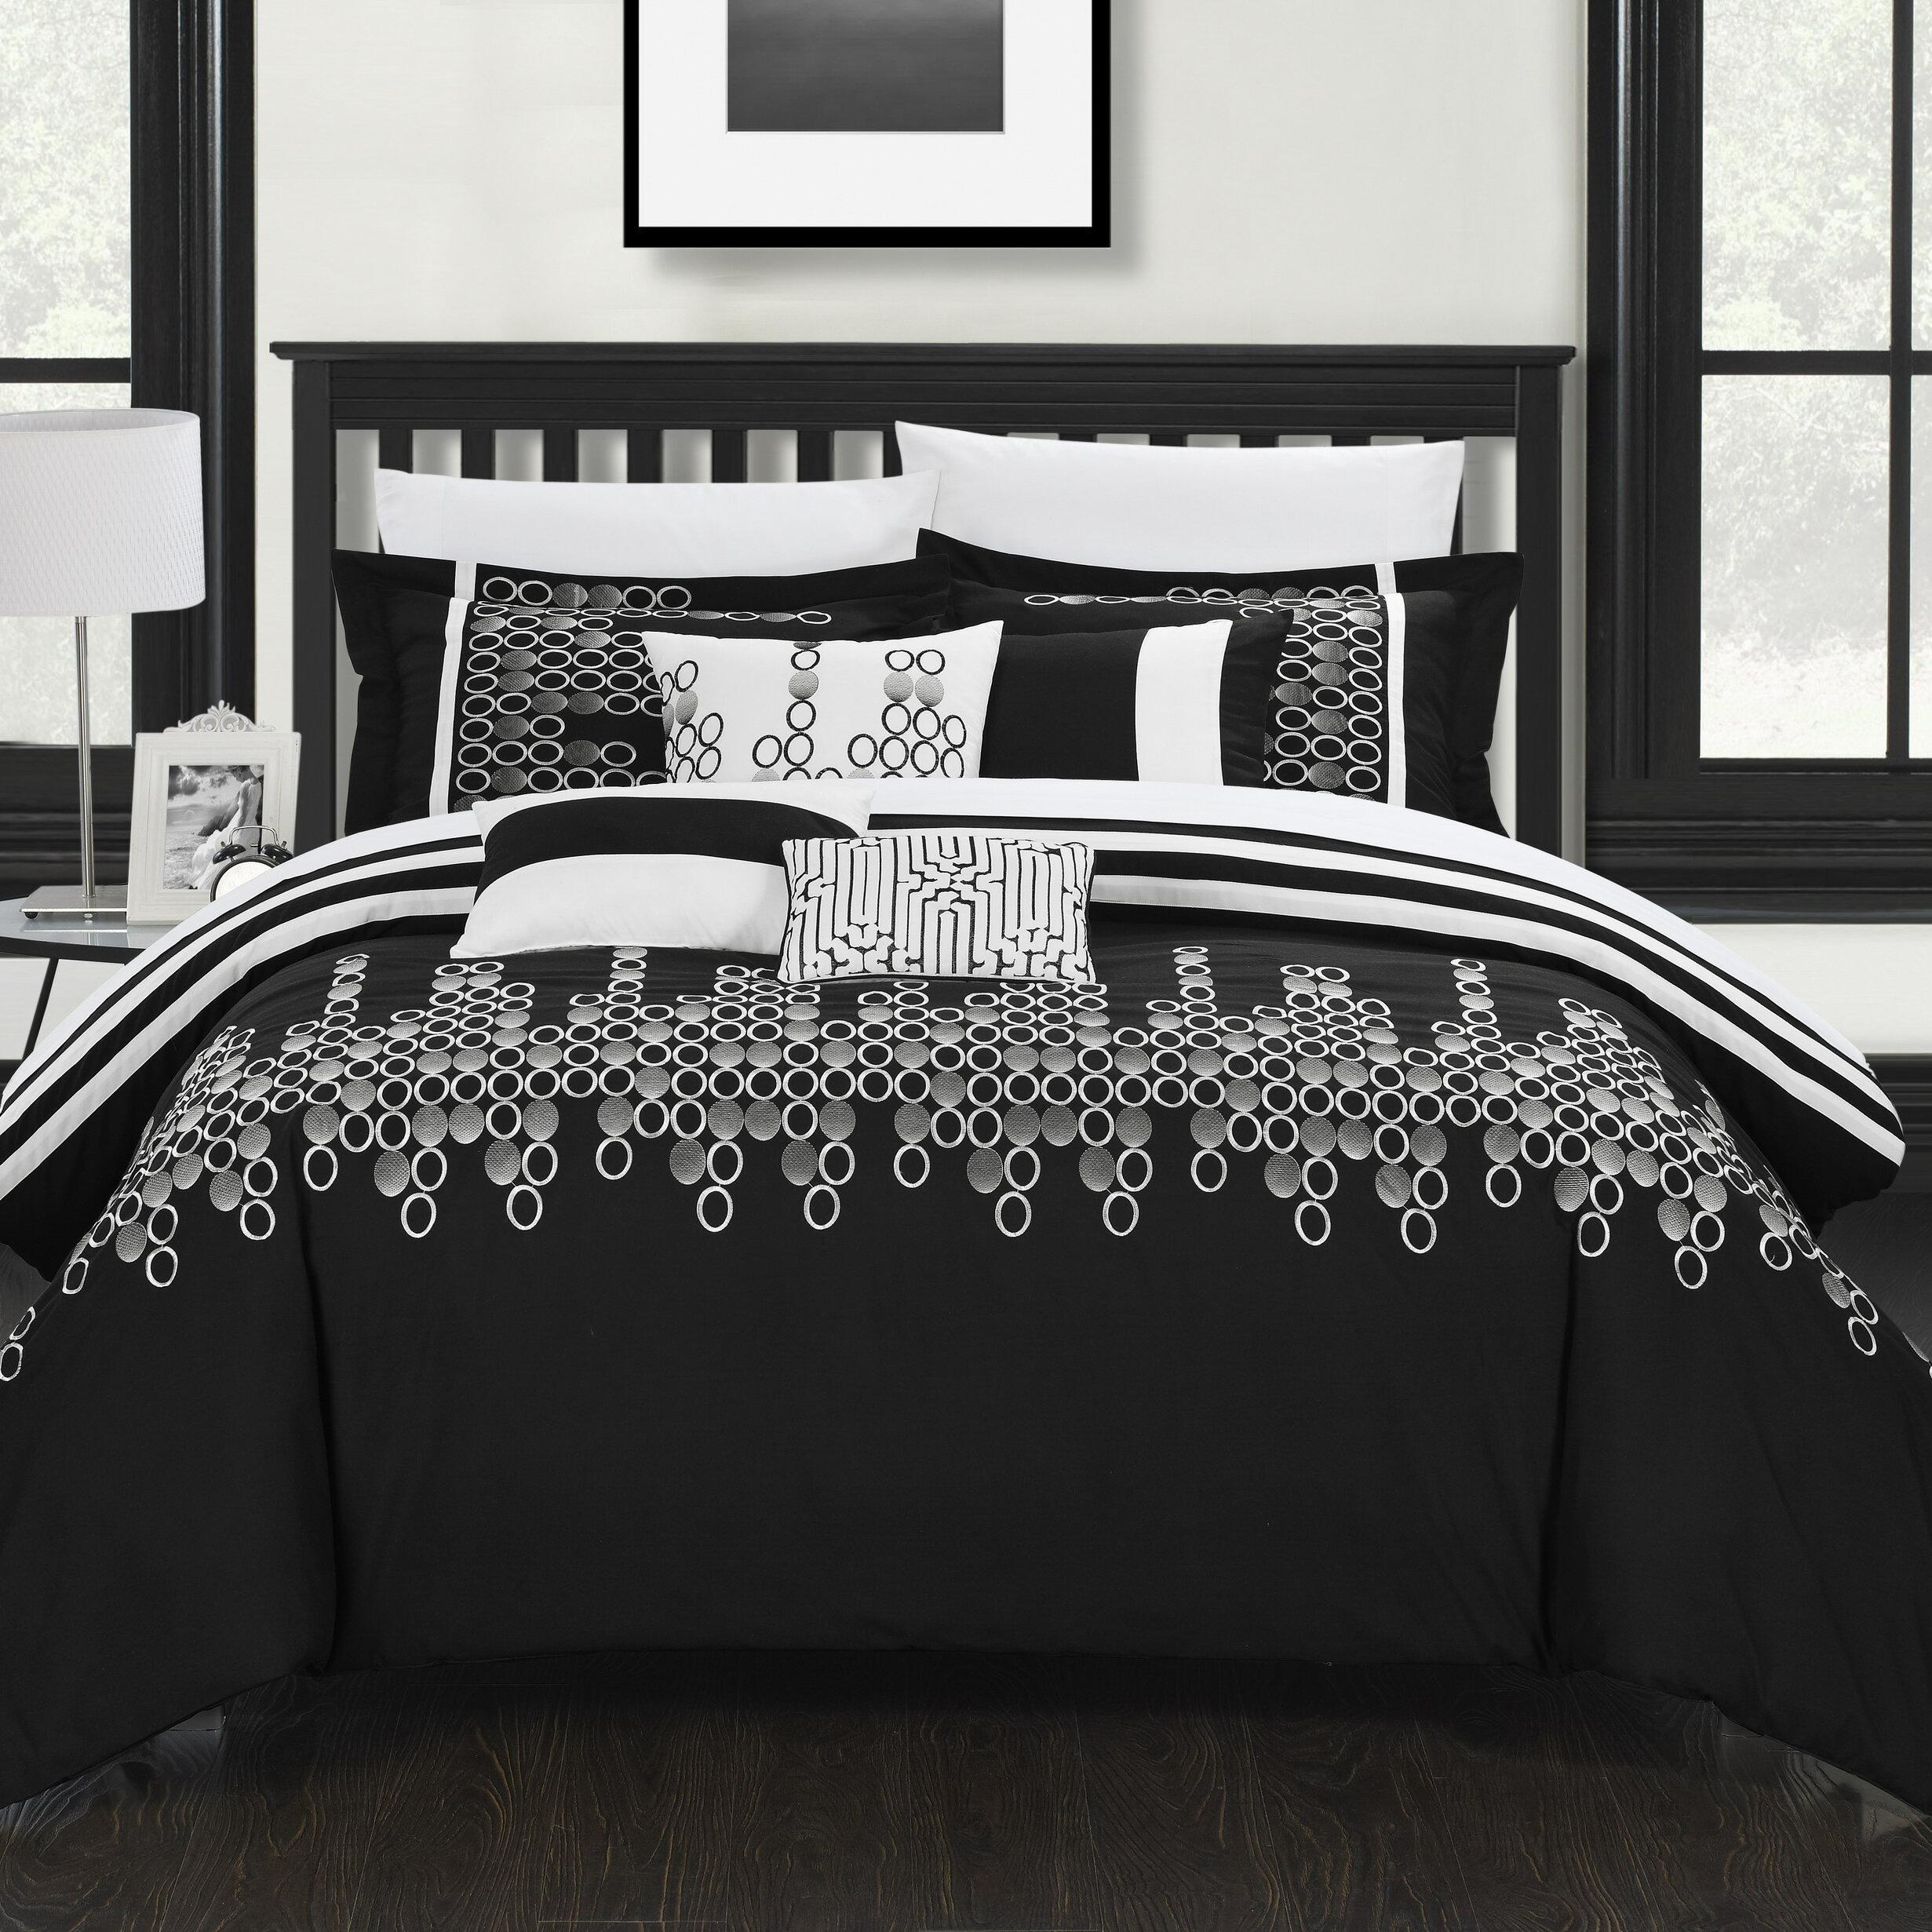 Black And White Hotel Bedding | Wayfair